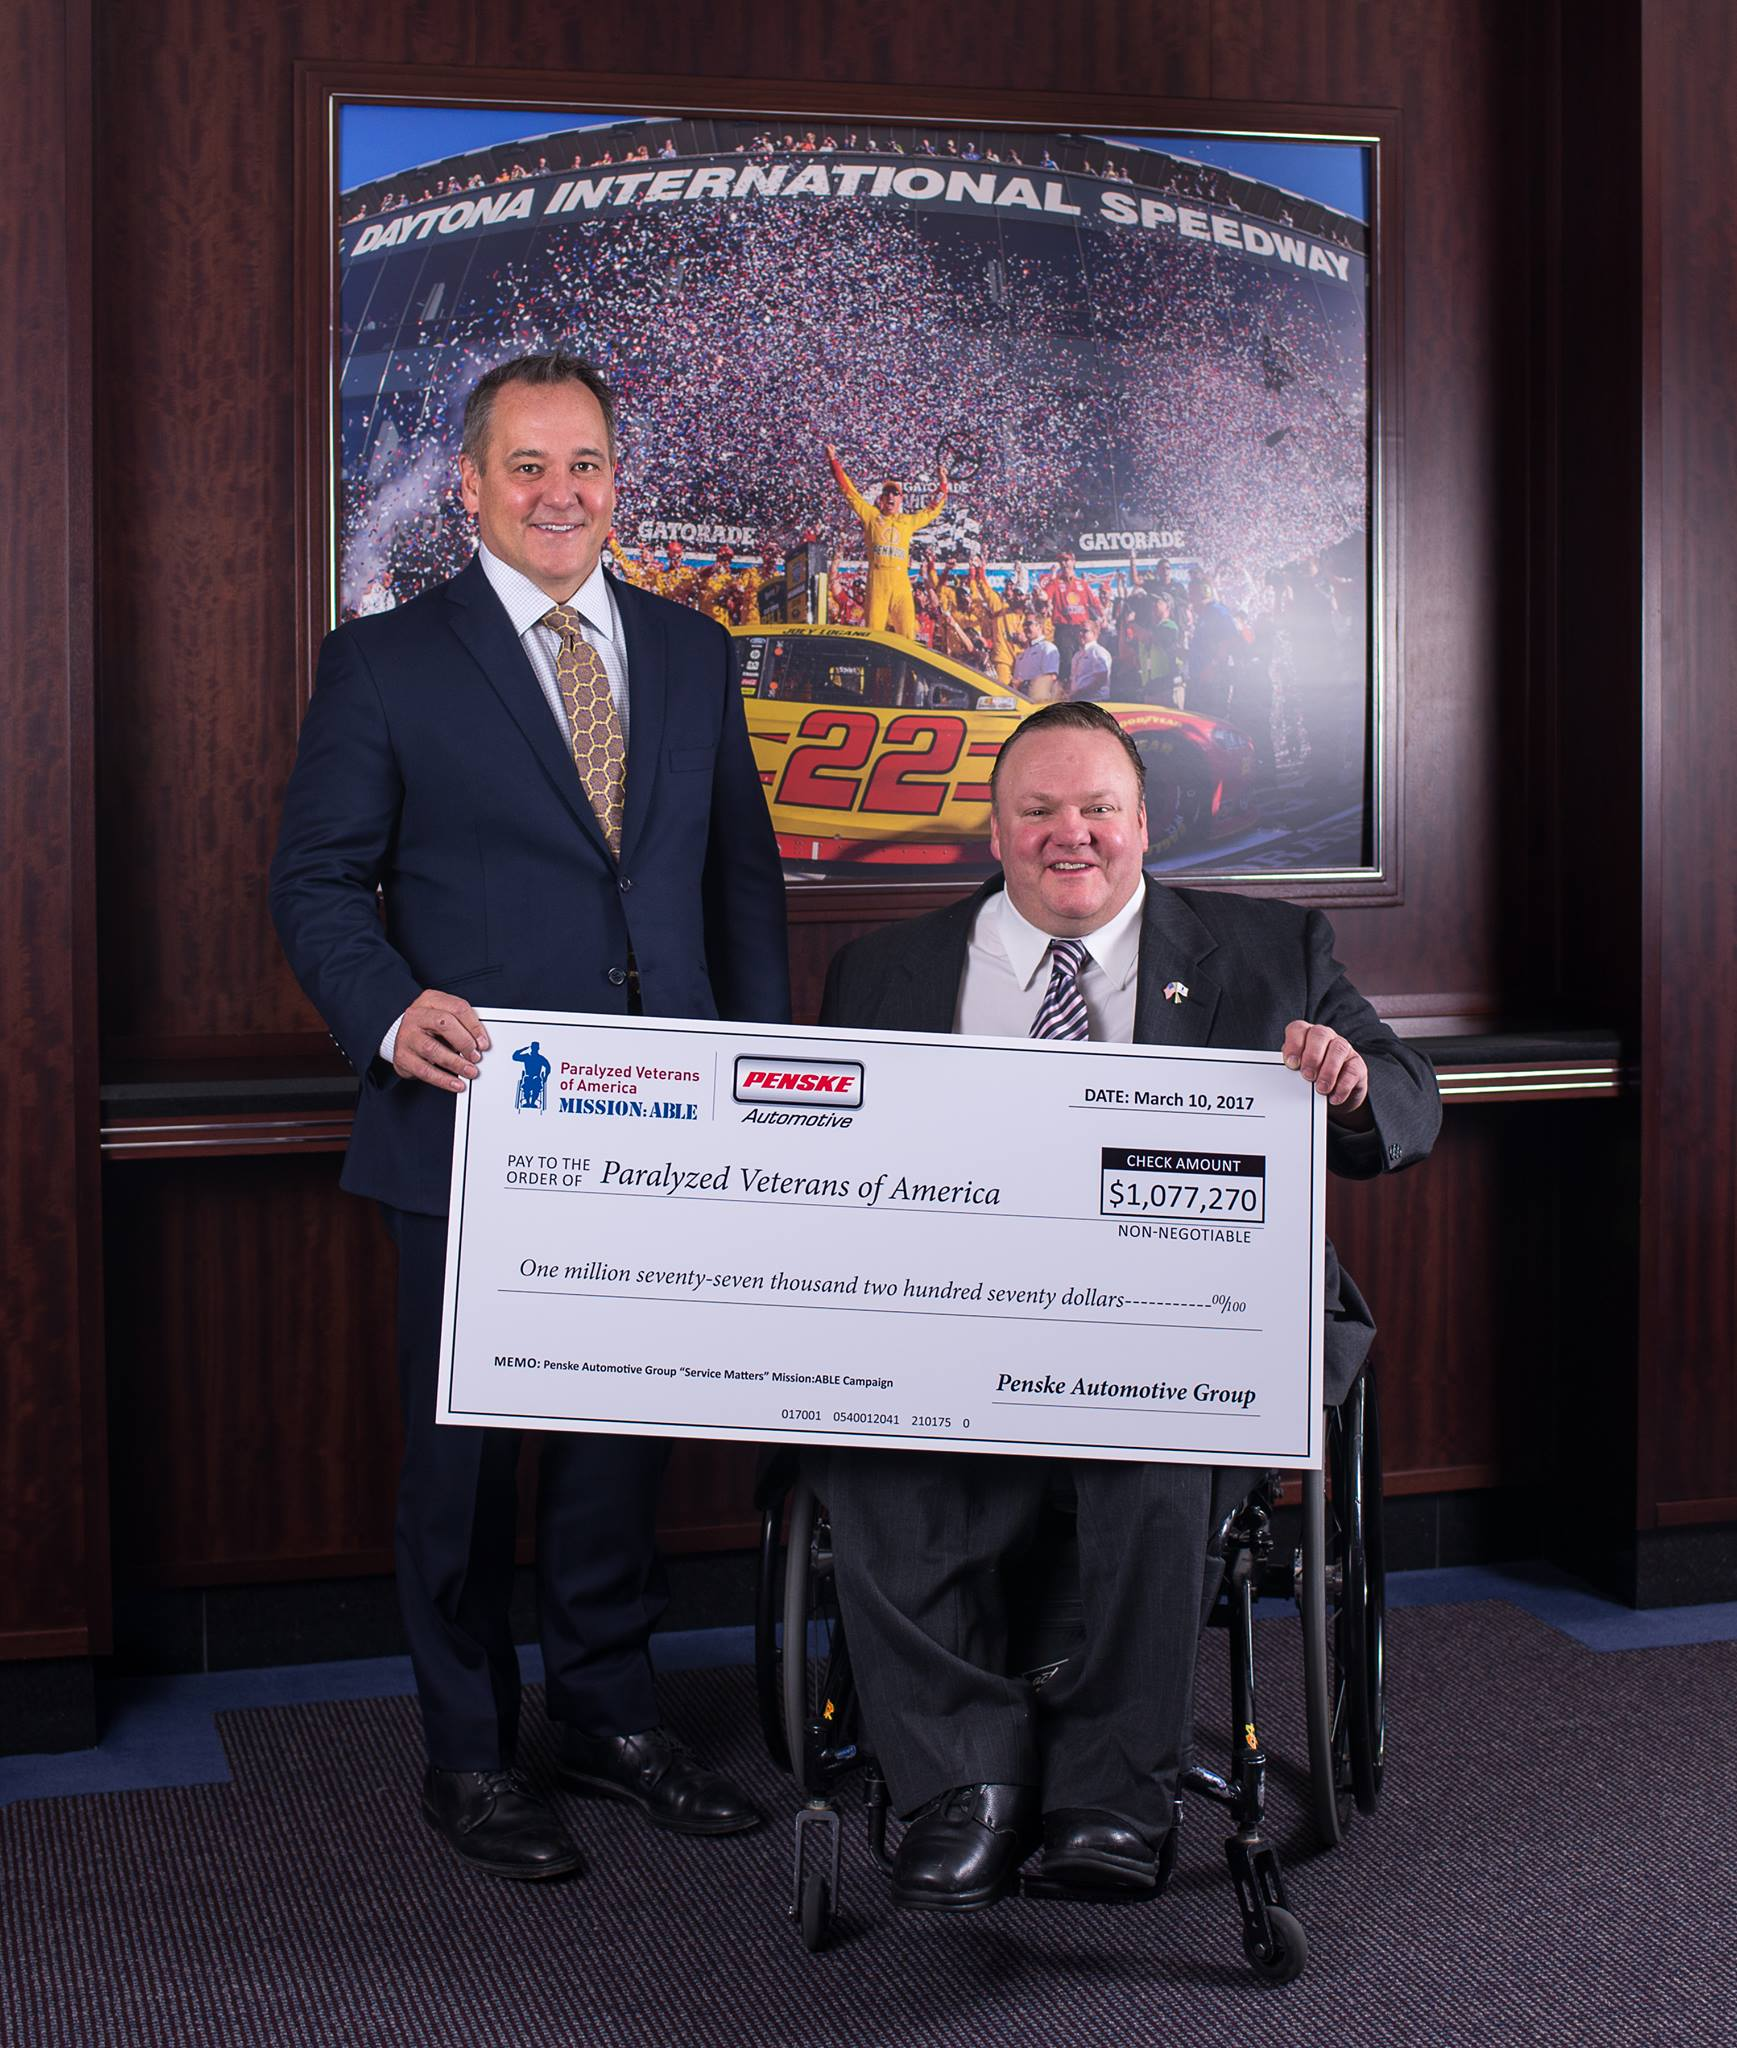 Rob Kurnick, President of Penske Automotive Group and Tom Wheaton, National Treasurer of Paralyzed Veterans of America.